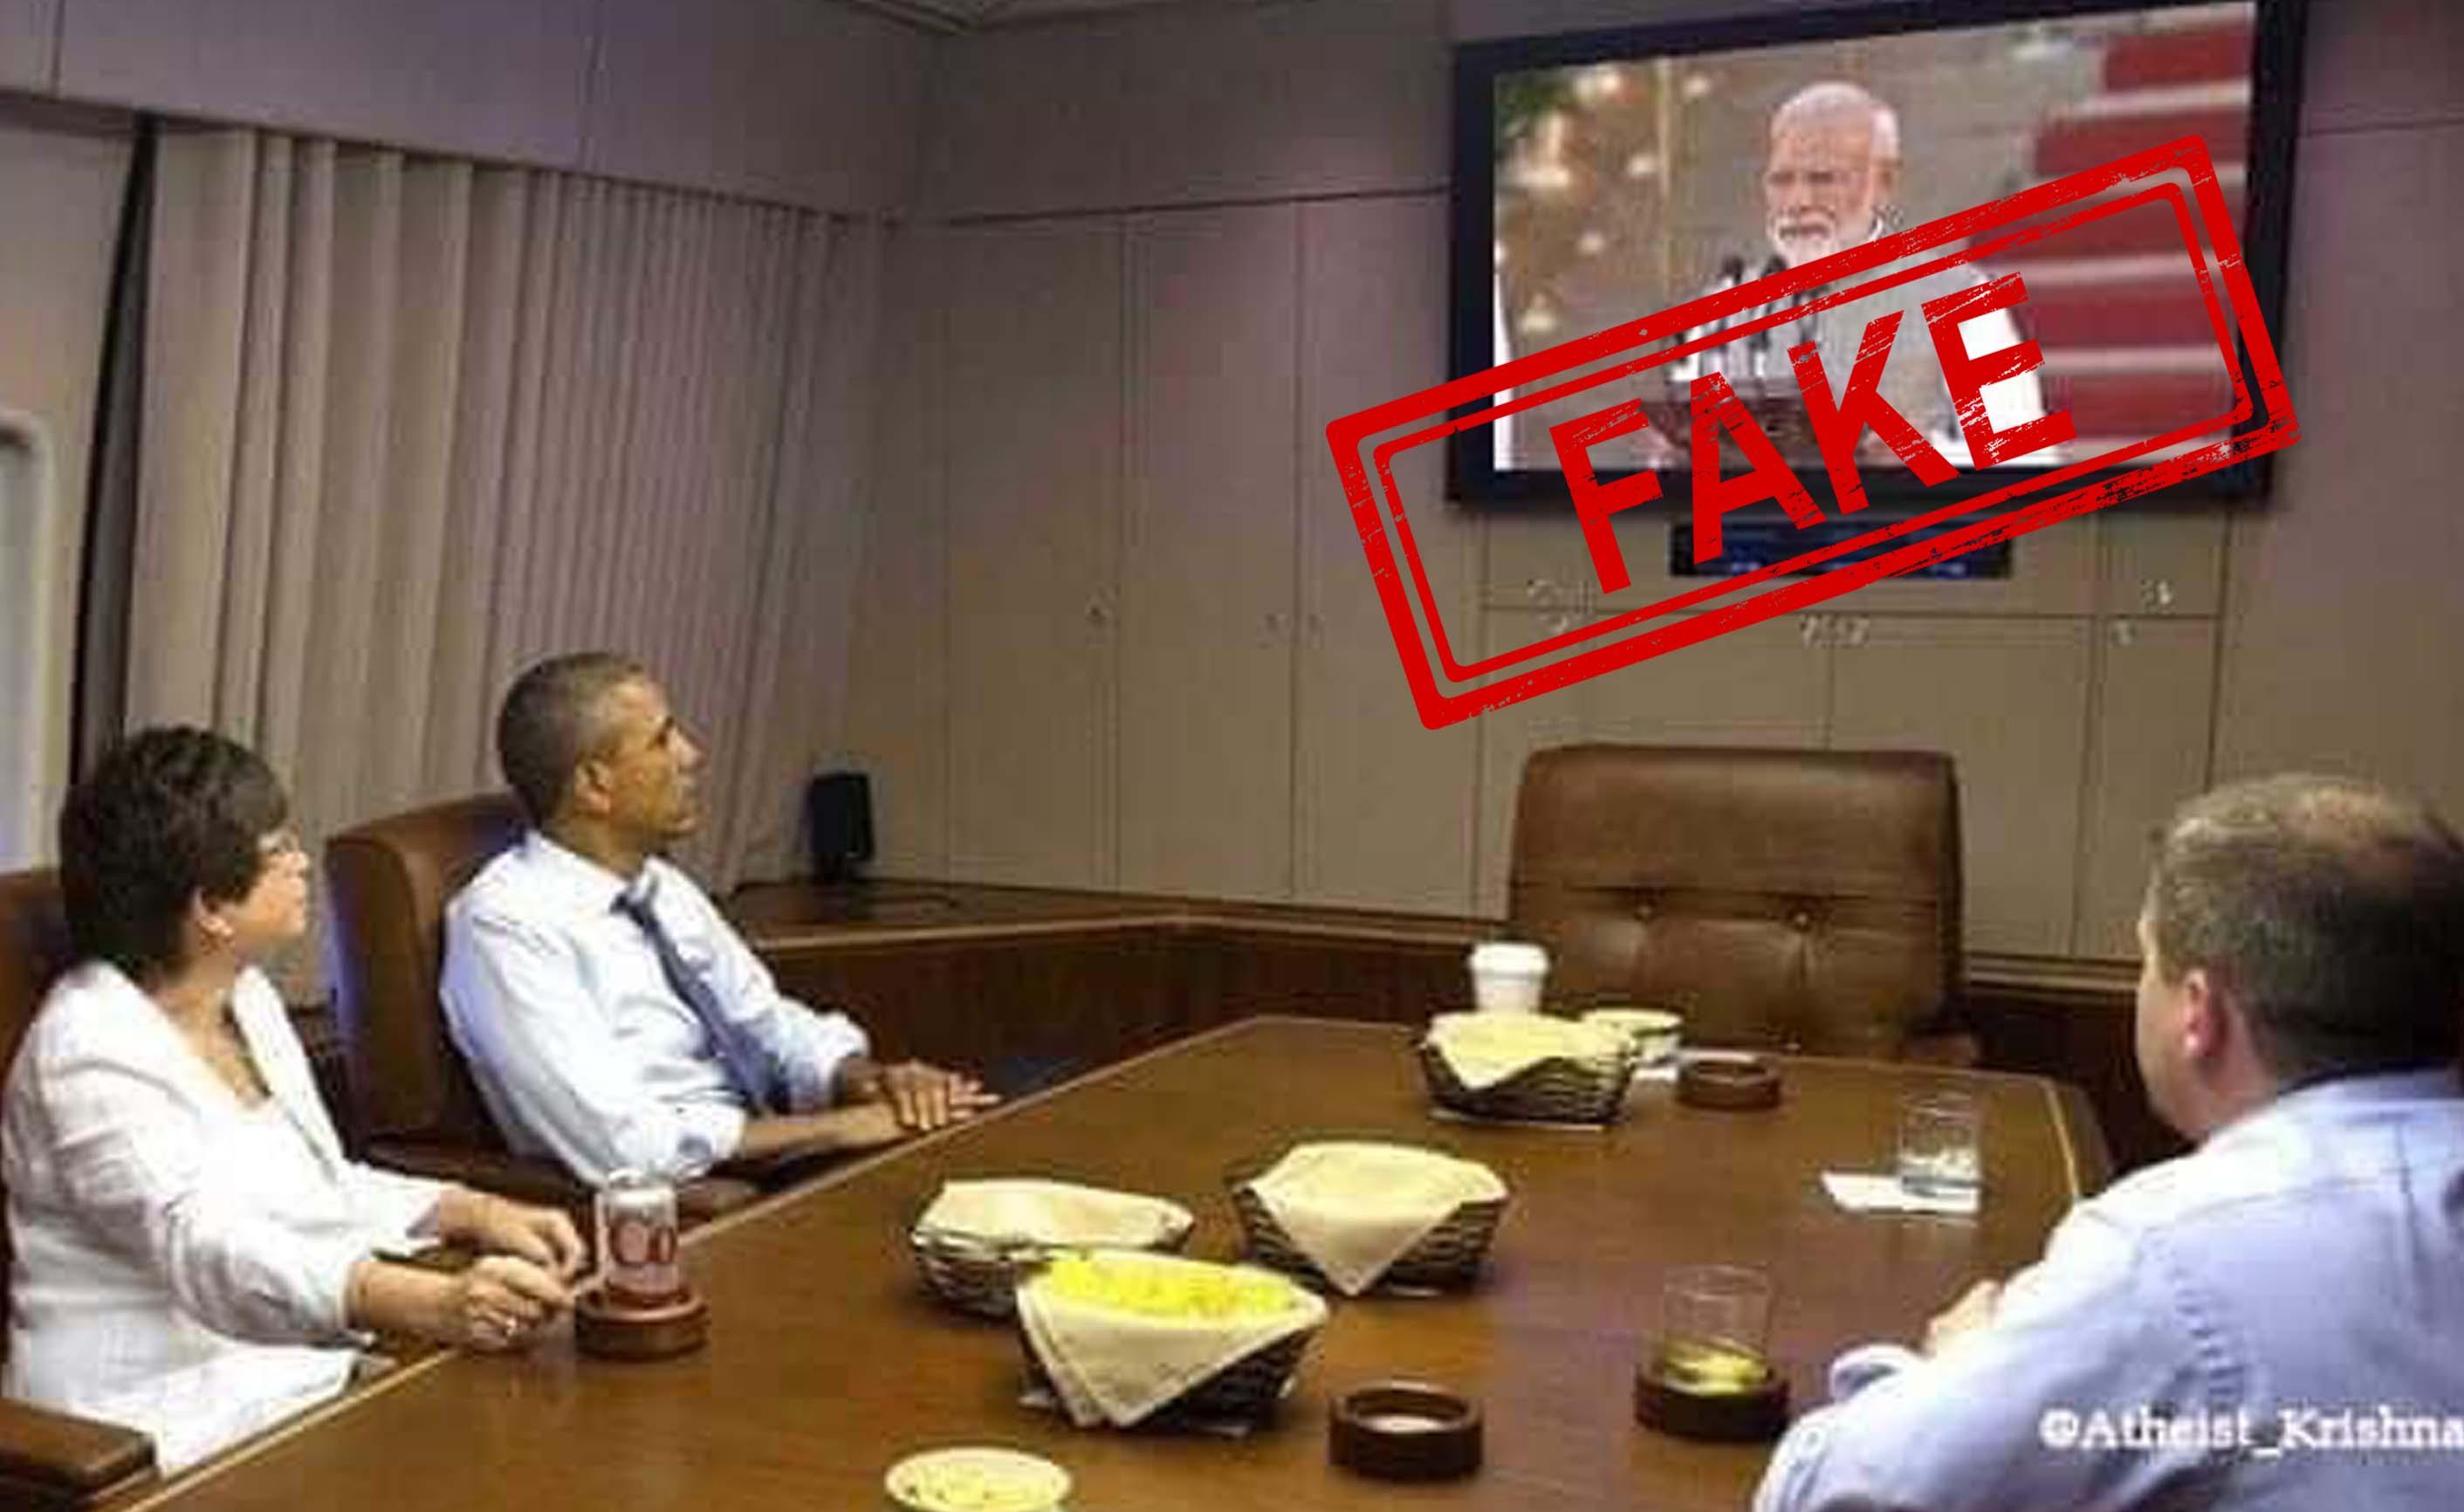 Barack Obama, Former, United States, President, Barack Obama, Prime Minister, Narendra Modi, Swearing in, NewsMobile, Mobile, News, India, Fact Check, Fact Checker, India